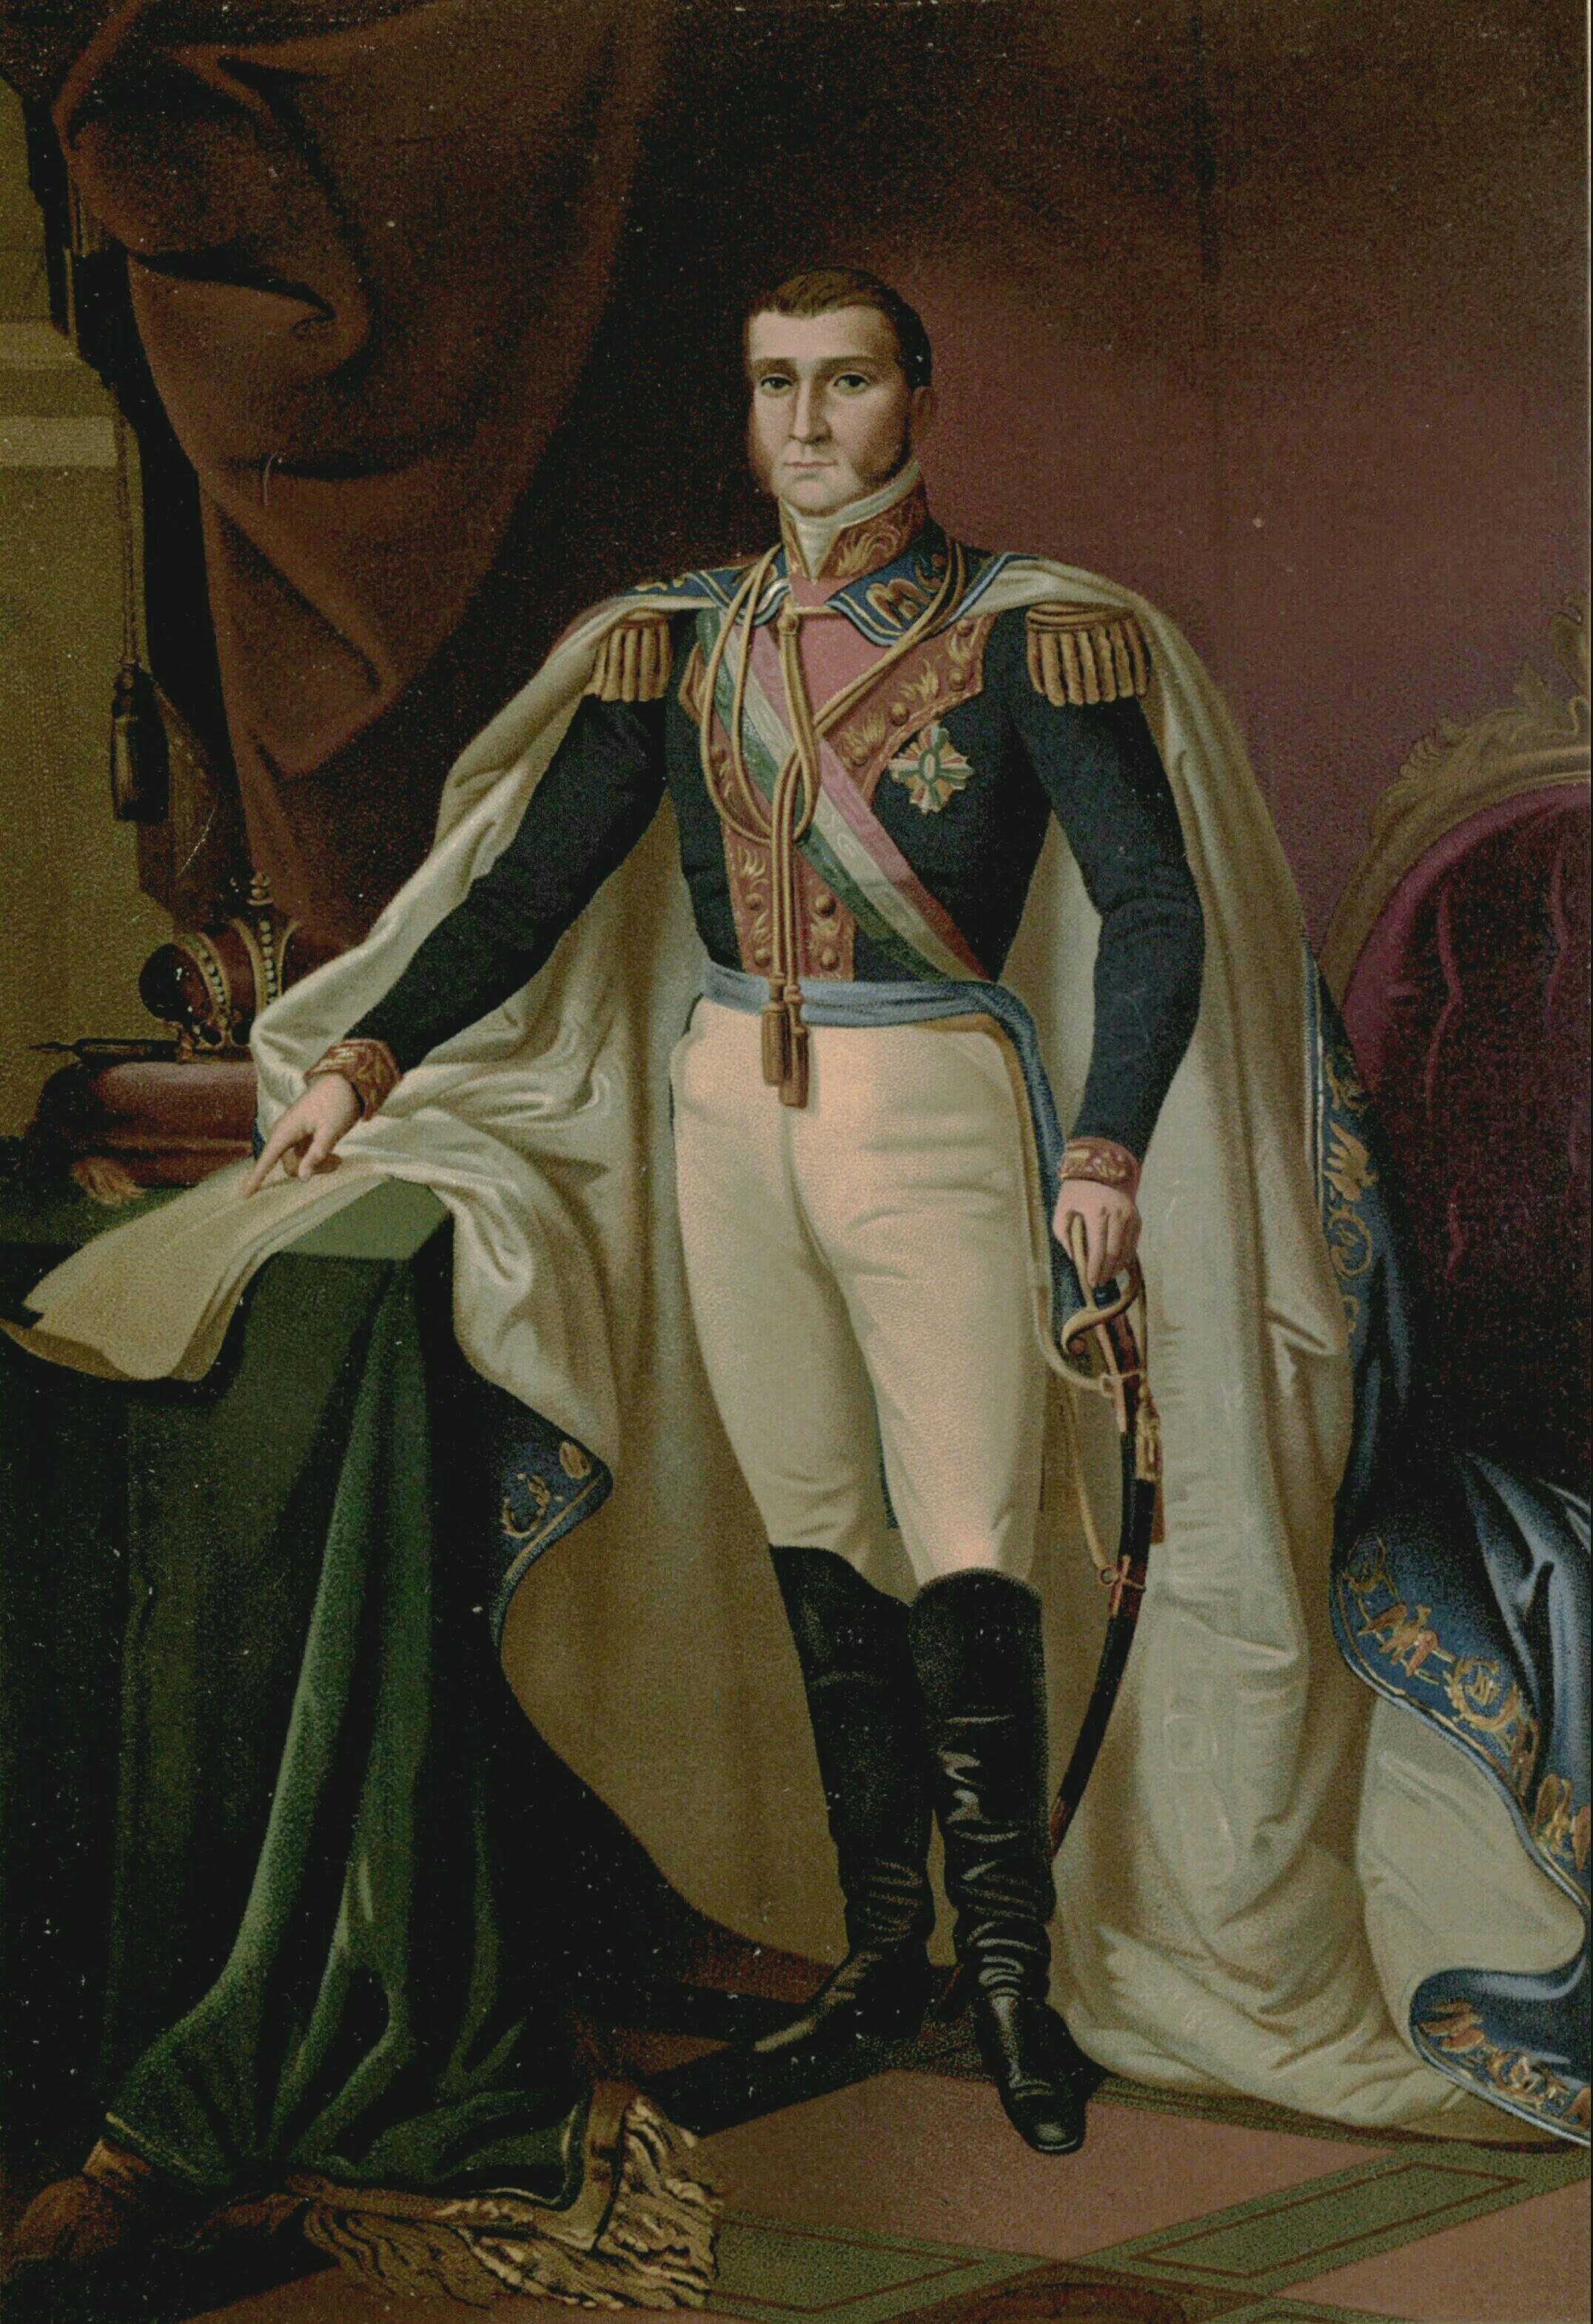 Fichier:Emperor Agustin I kroningsportret.JPG